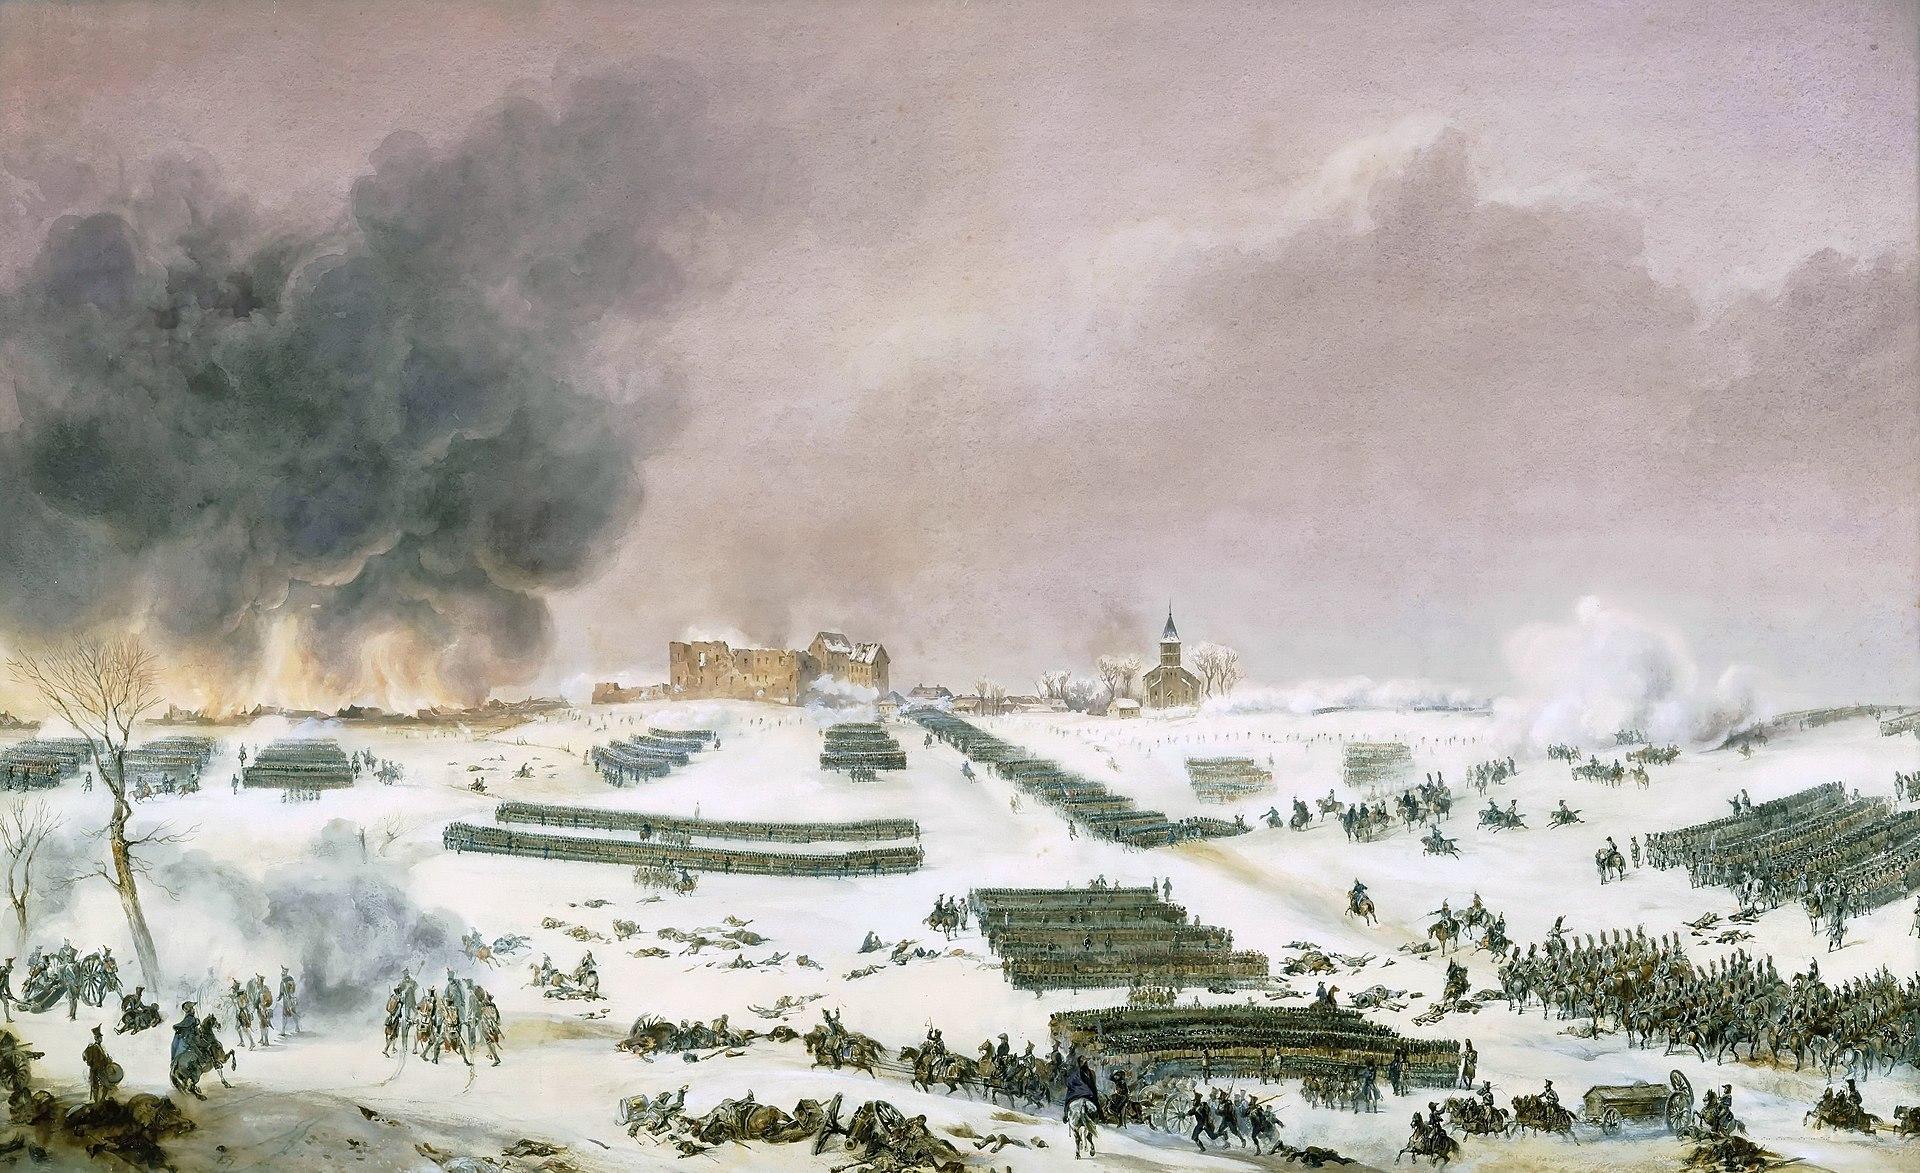 Битва при Эйлау 1807 - нападение на кладбище, Жан-Антуан-Симеон.jpg